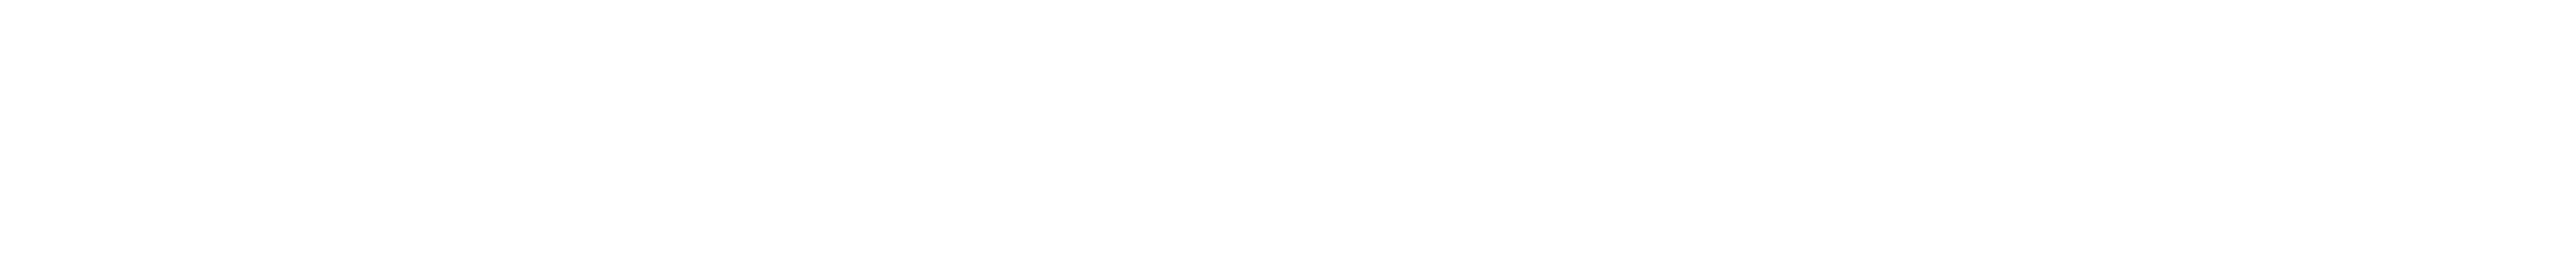 Pop-In@Nordstrom x Gentle Monster. January 6-February 5. 360 Degrees of Gentle Monster.